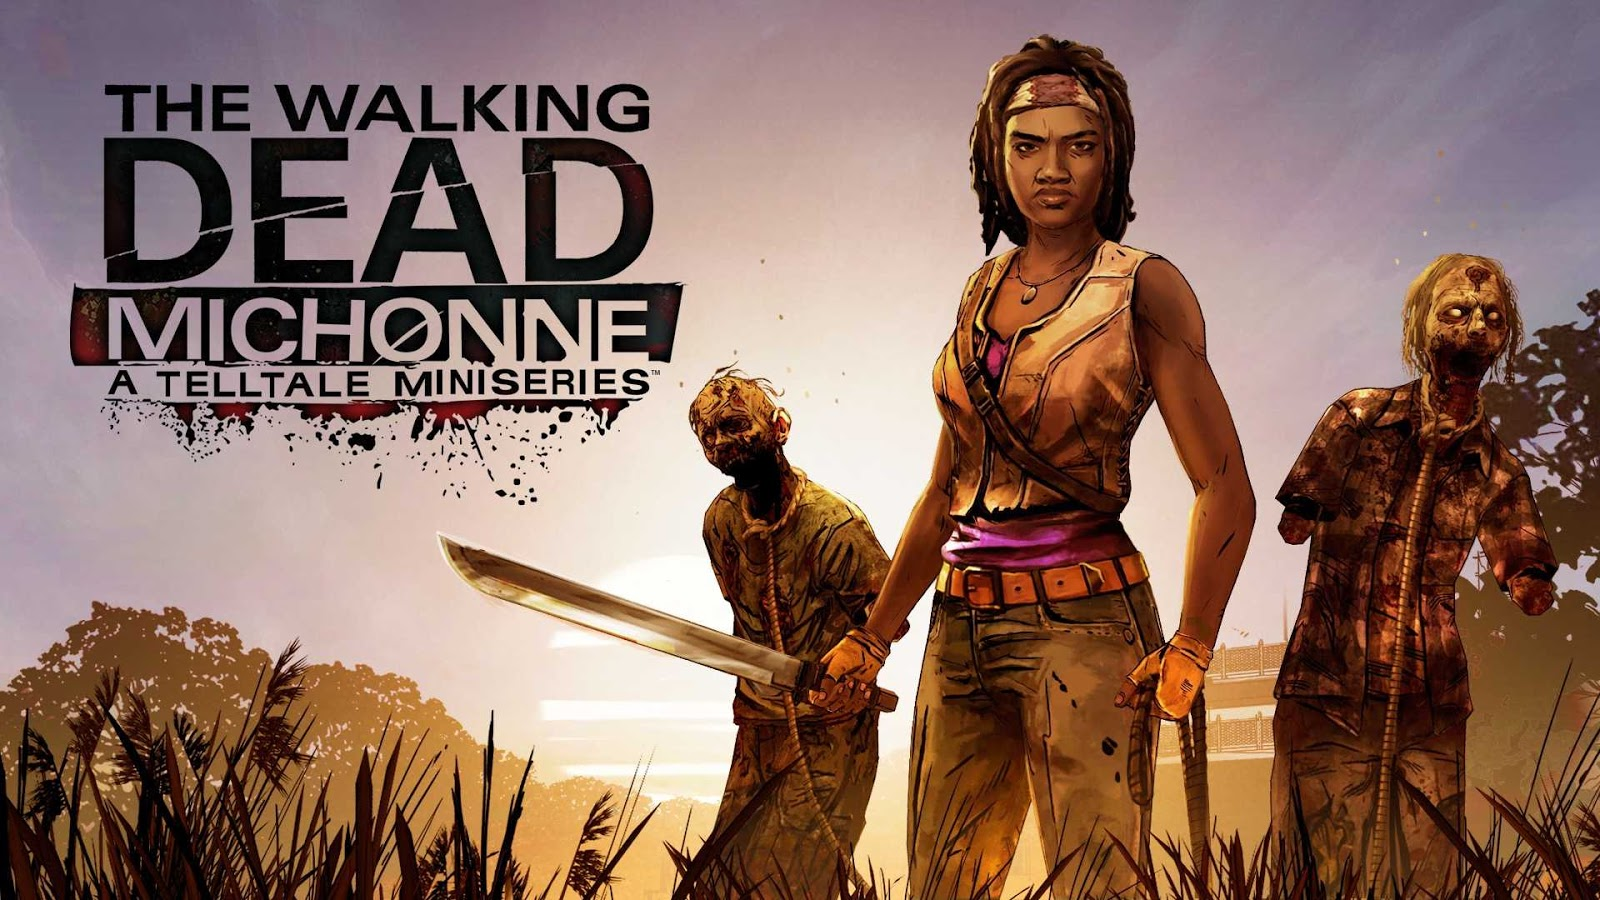 the-walking-dead-michonne-a-telltale-miniseries